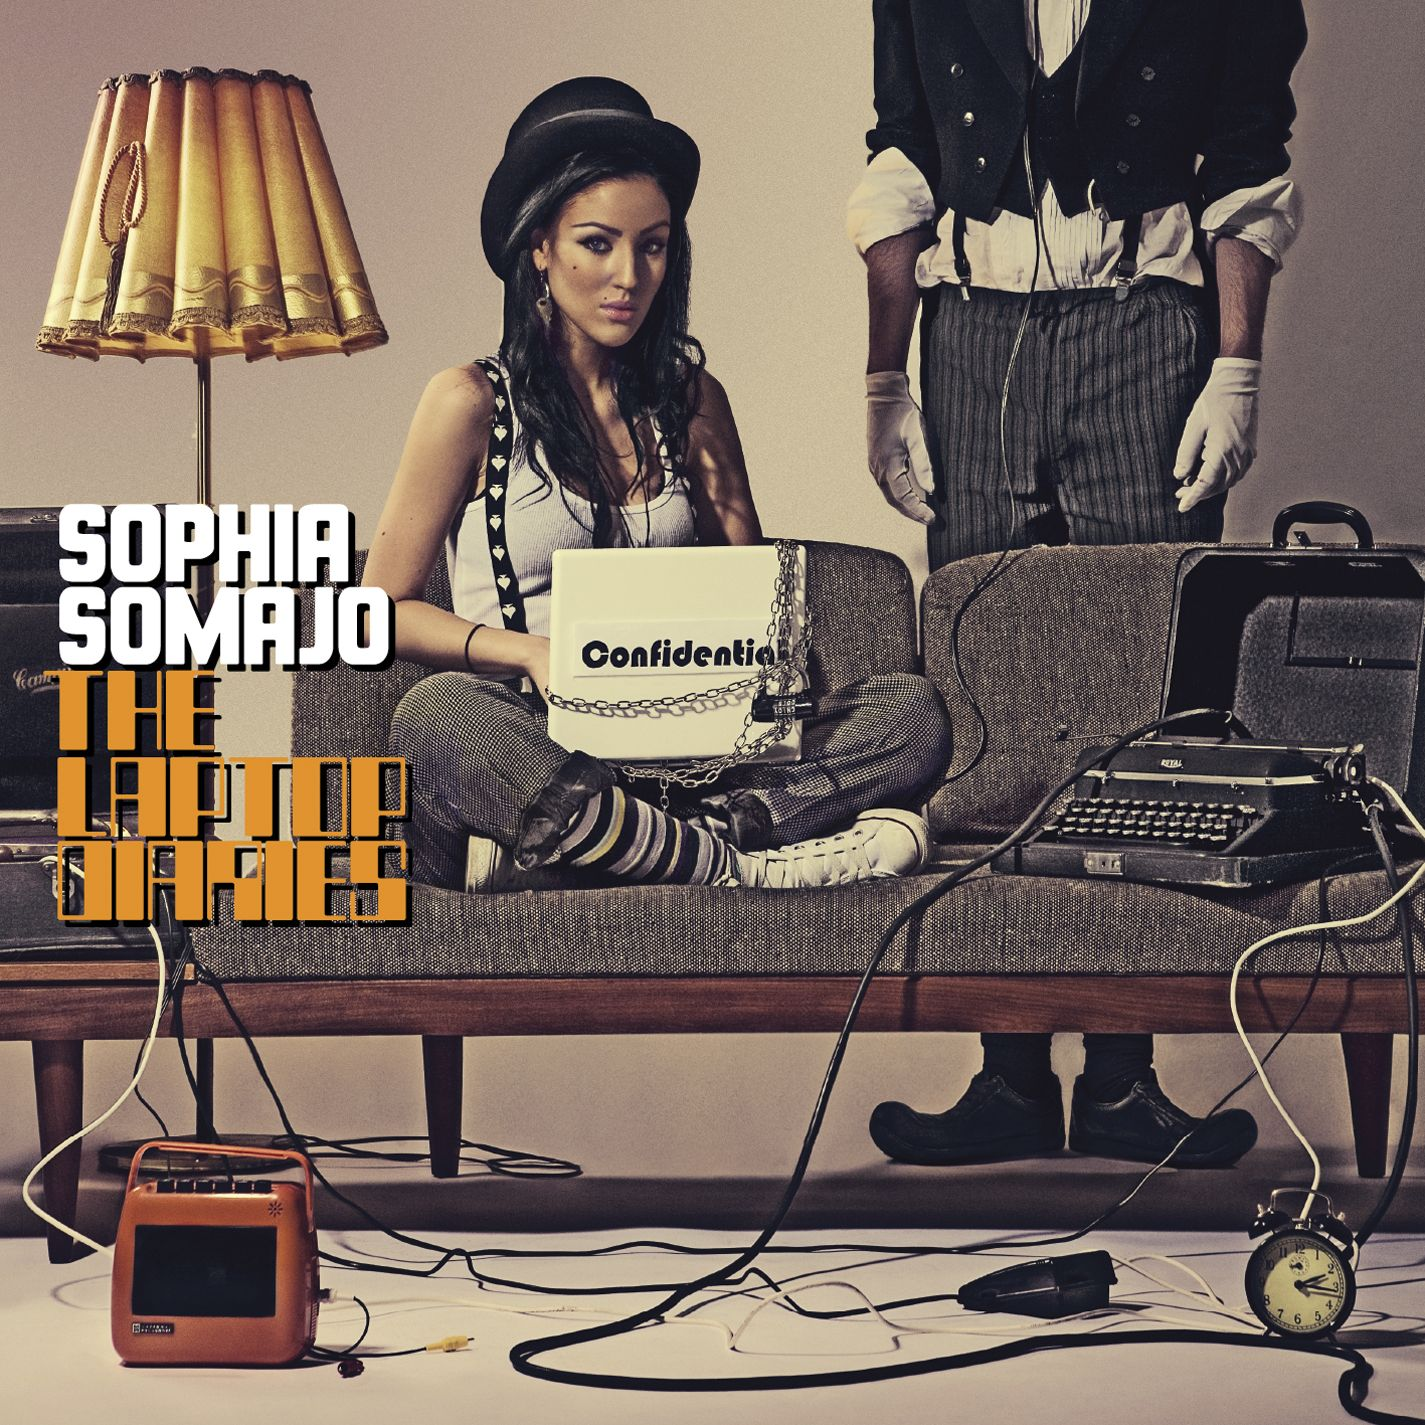 sophia somajo beg n crawl Beattraaxx / Avatar Forever (Electro House Mix)